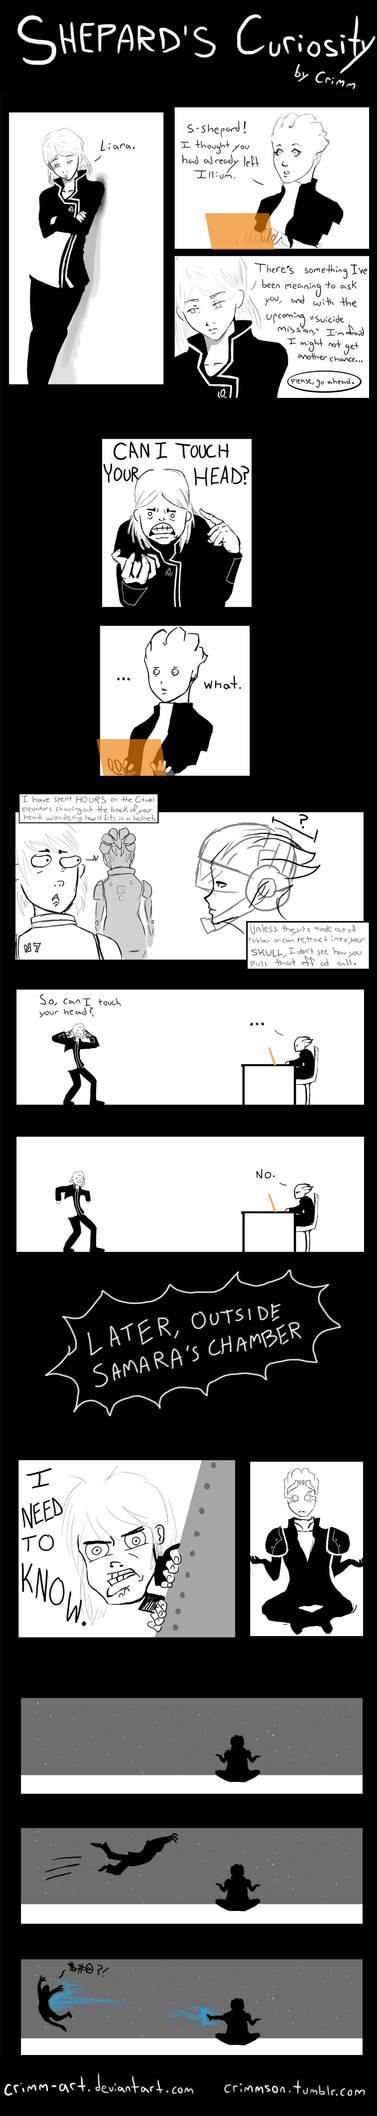 Shepard's Curiosity